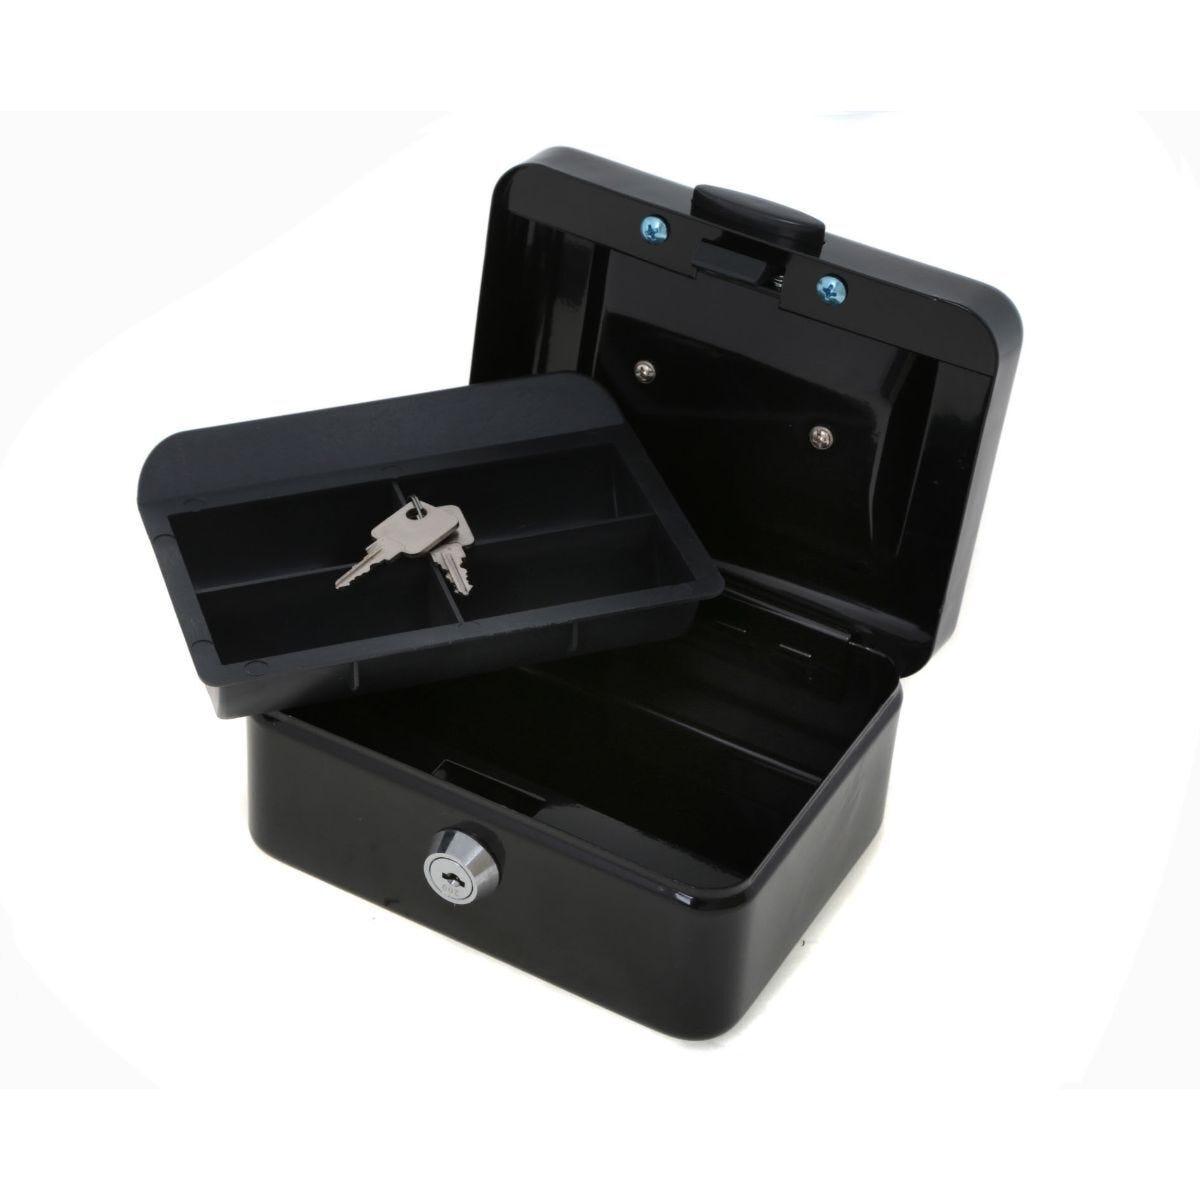 Ryman Button Release Cash Box H75xW150x110 Black